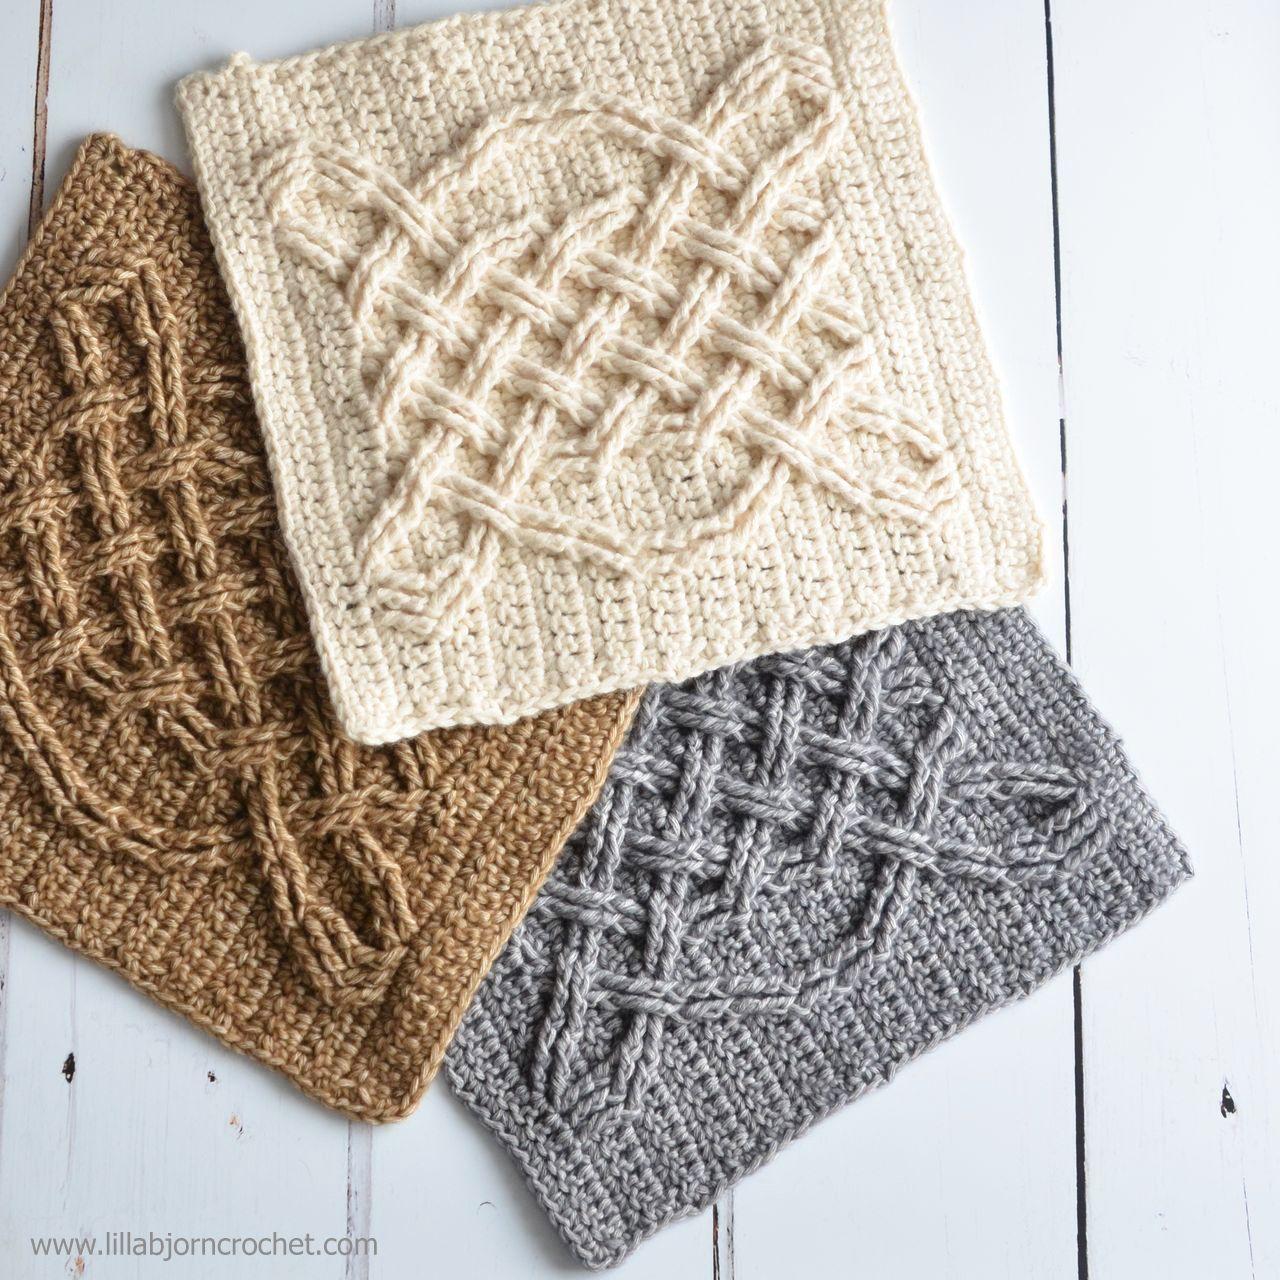 Celtic crochet square - free pattern by Lilla Bjorn | Needlework ...